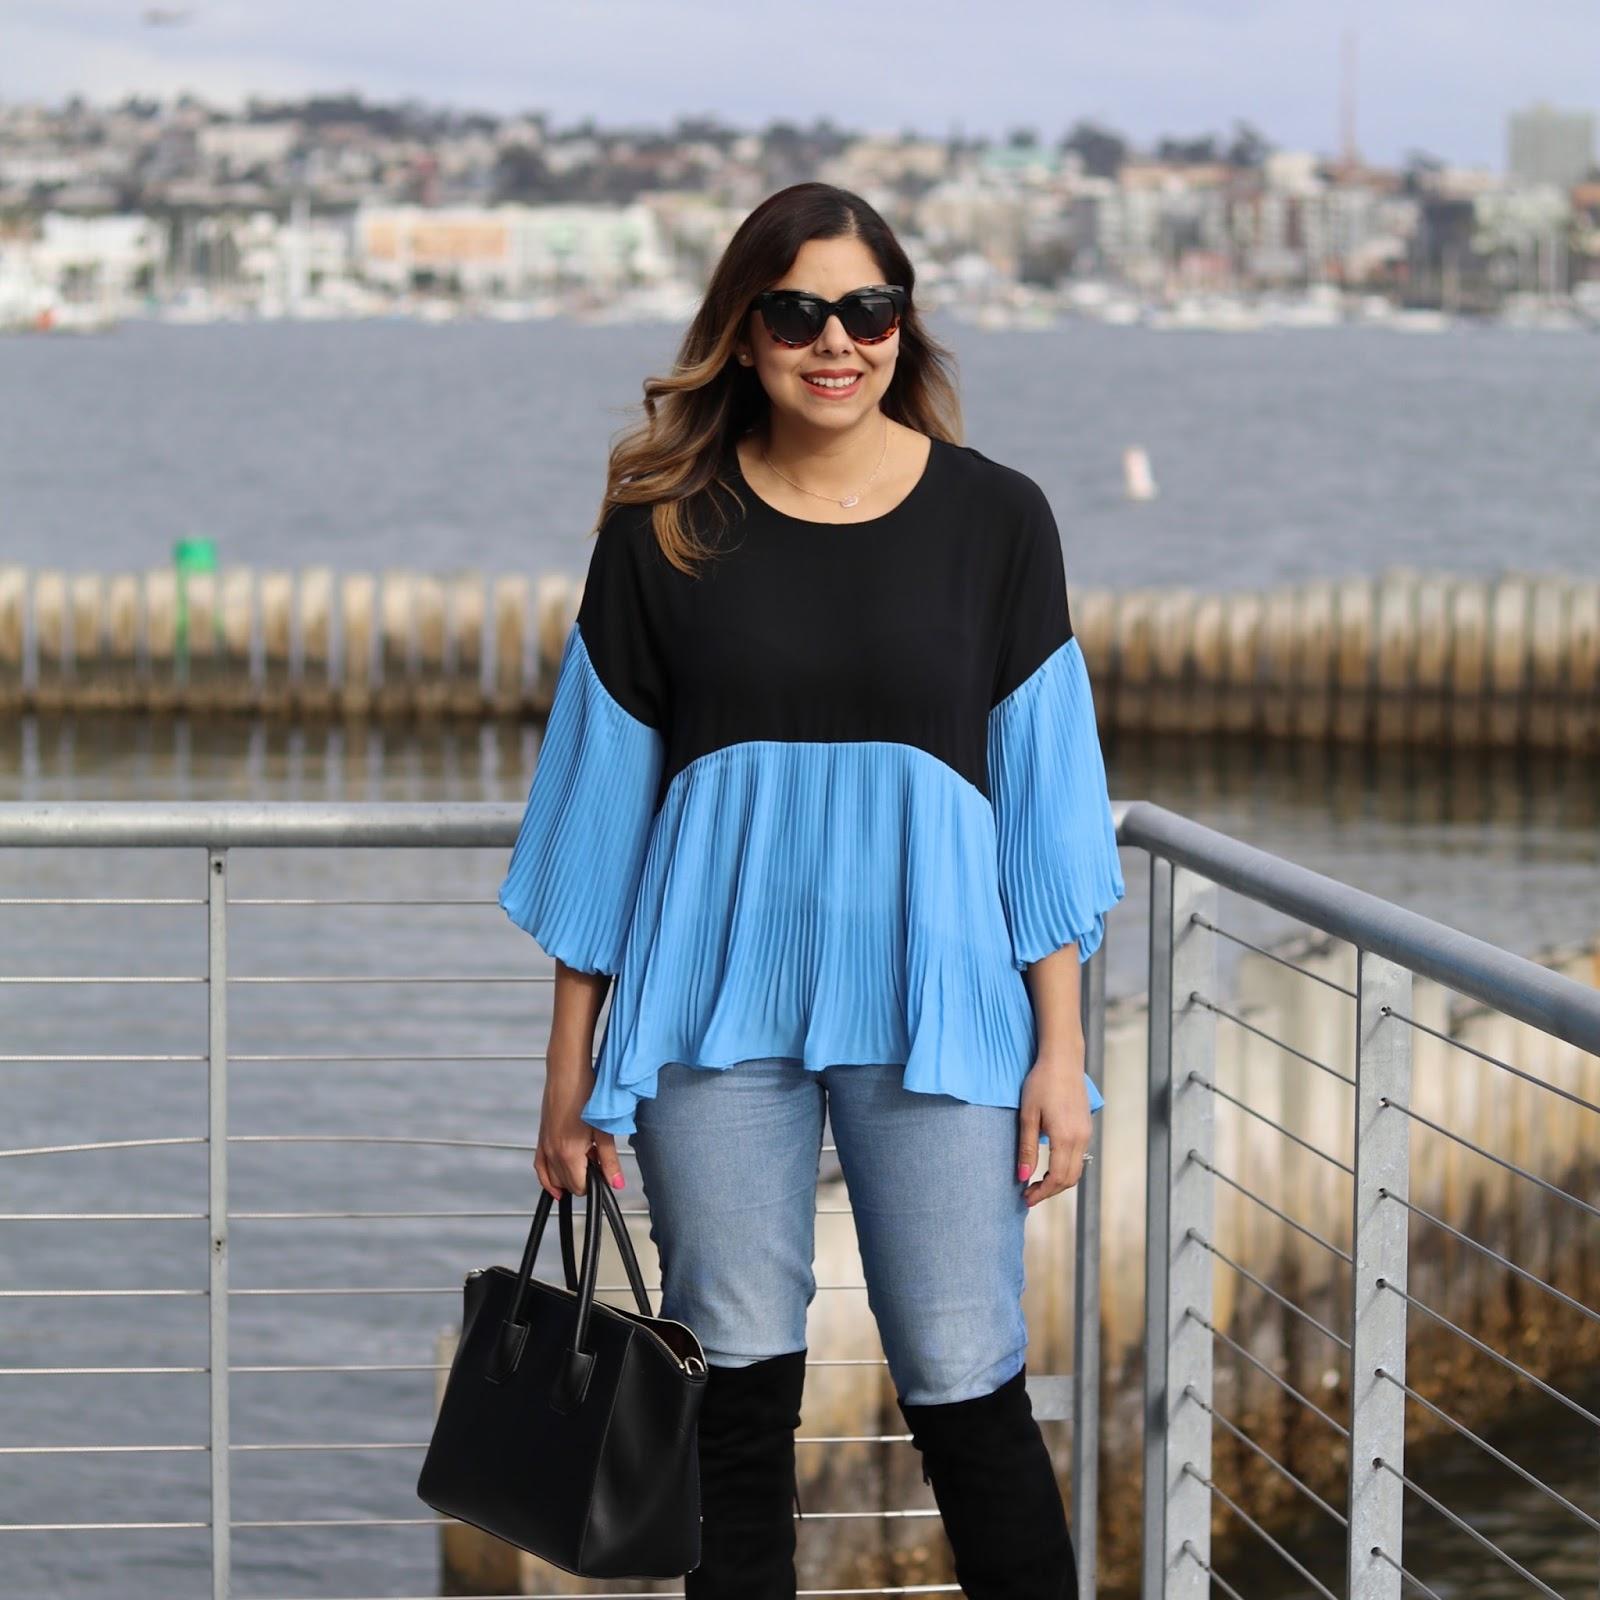 chicwish blogger, socal fashion blogger, chic affordable fashion